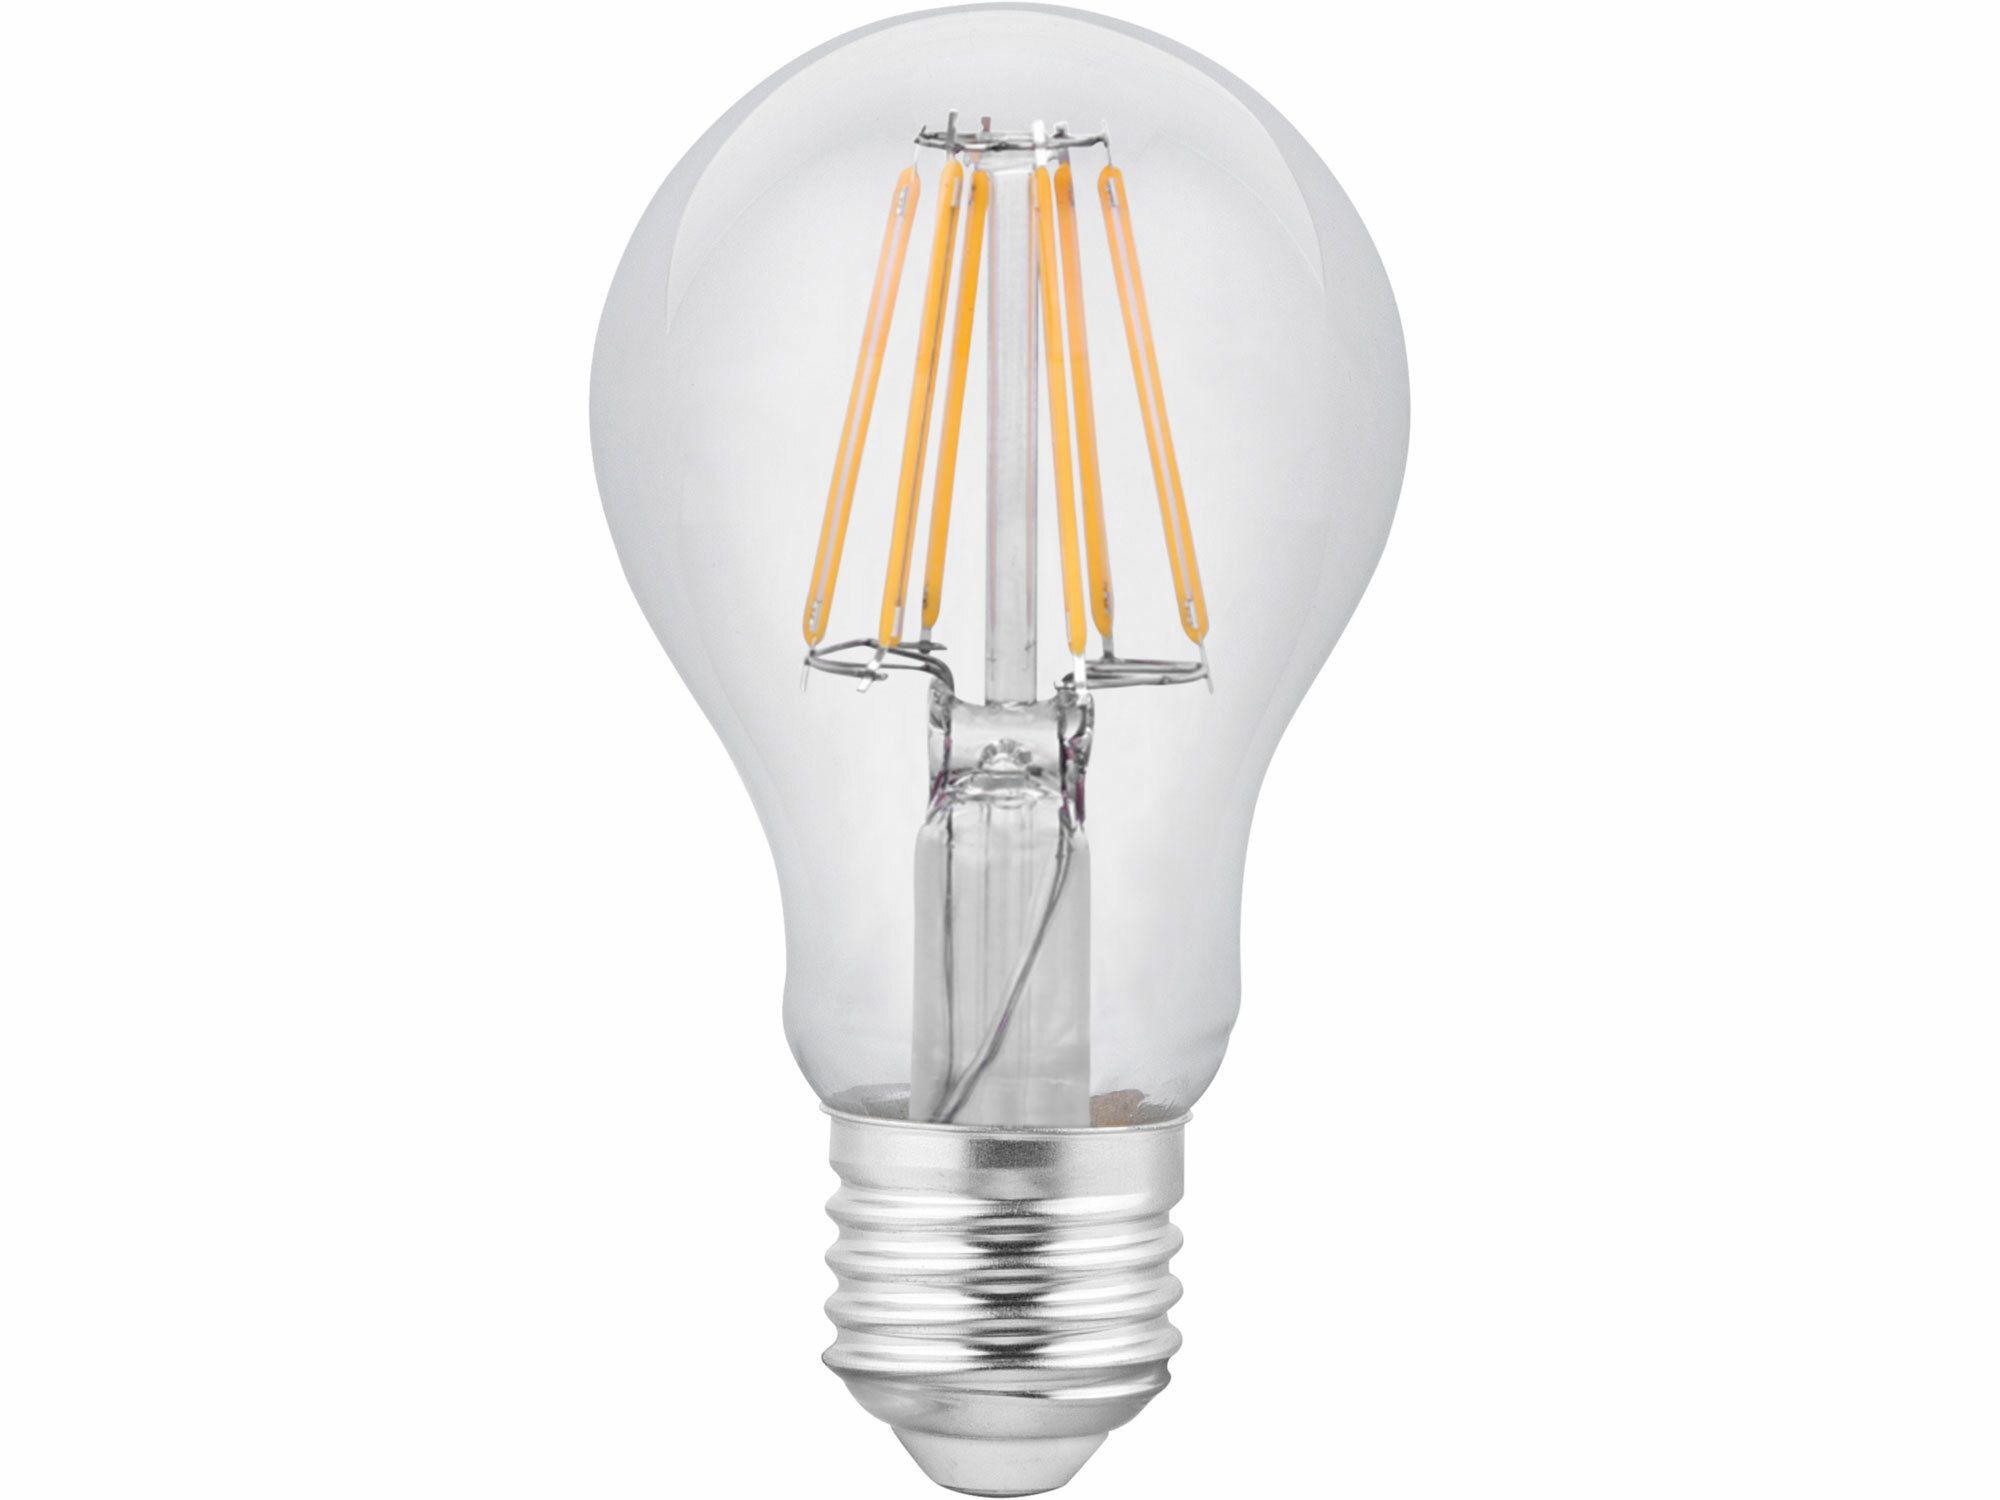 Žárovka LED 360°, 1000lm, 8W, E27, teplá bílá EXTOL-LIGHT